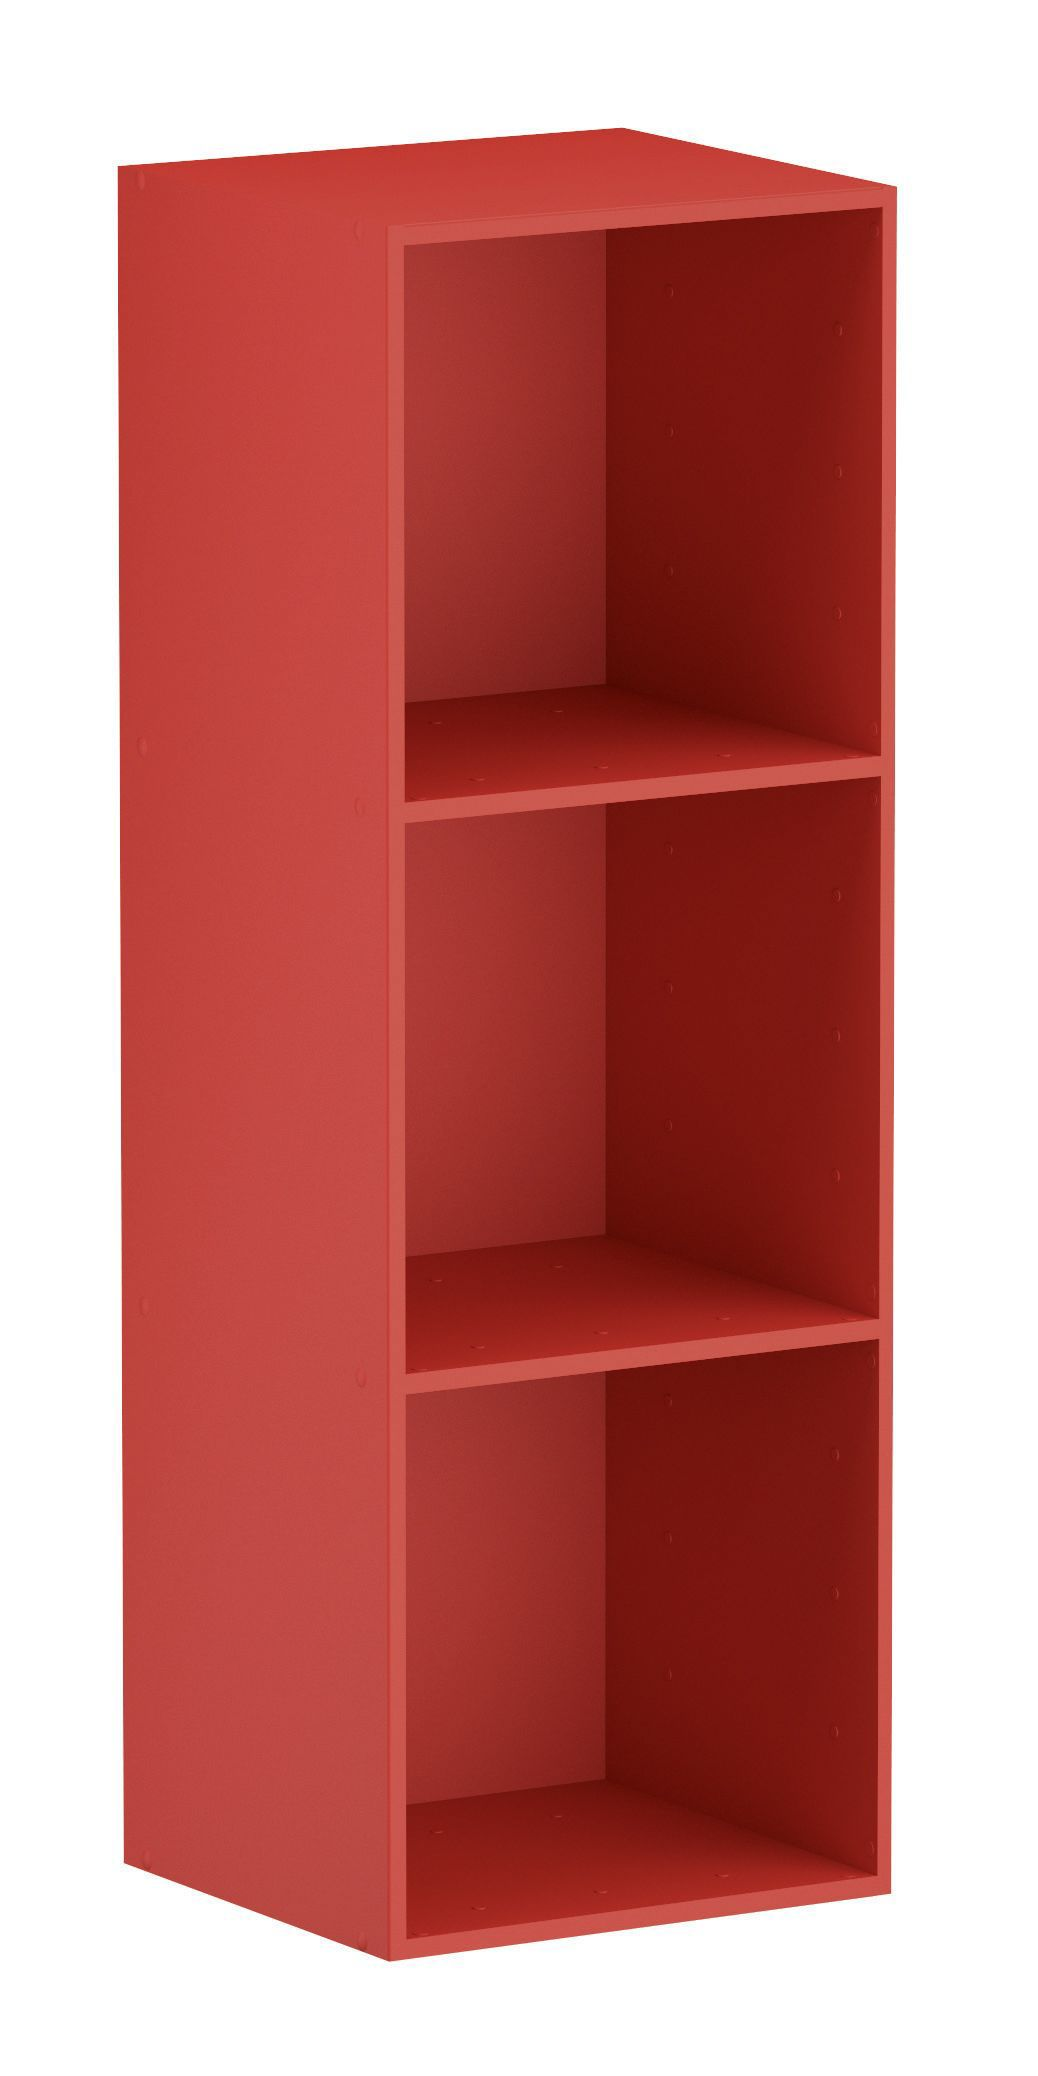 Shelving Units Home Storage Diy At Bq